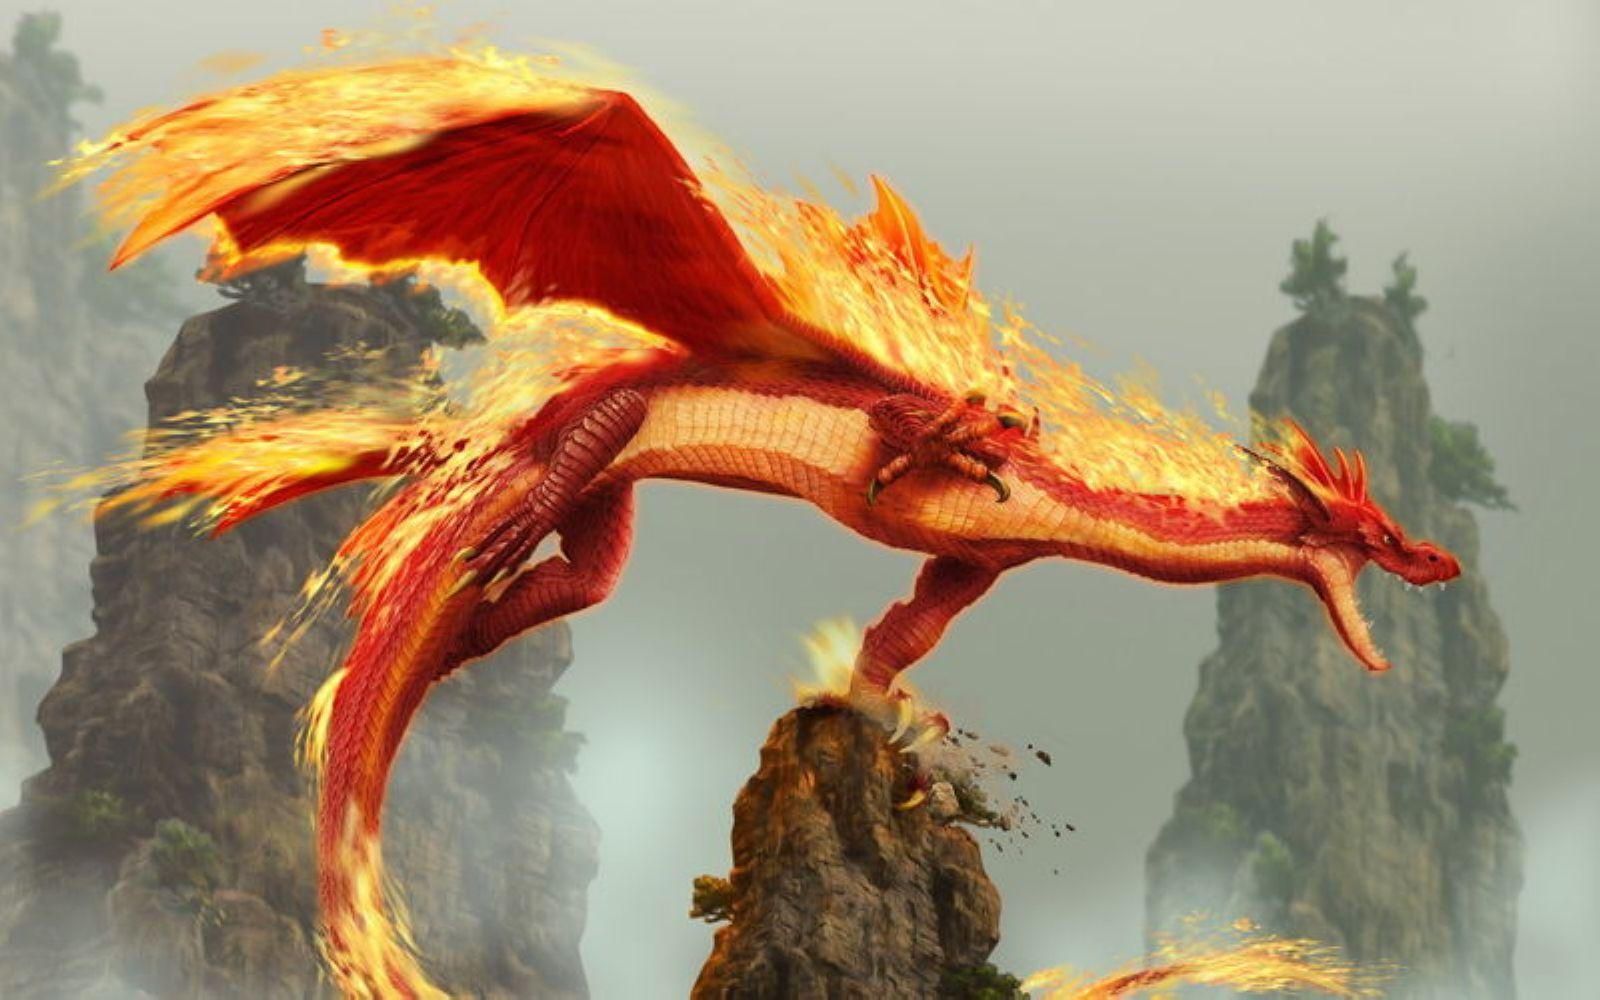 maya 我想要一些 火龙的图片 外国的那种龙 最好是大量的 请问哪能